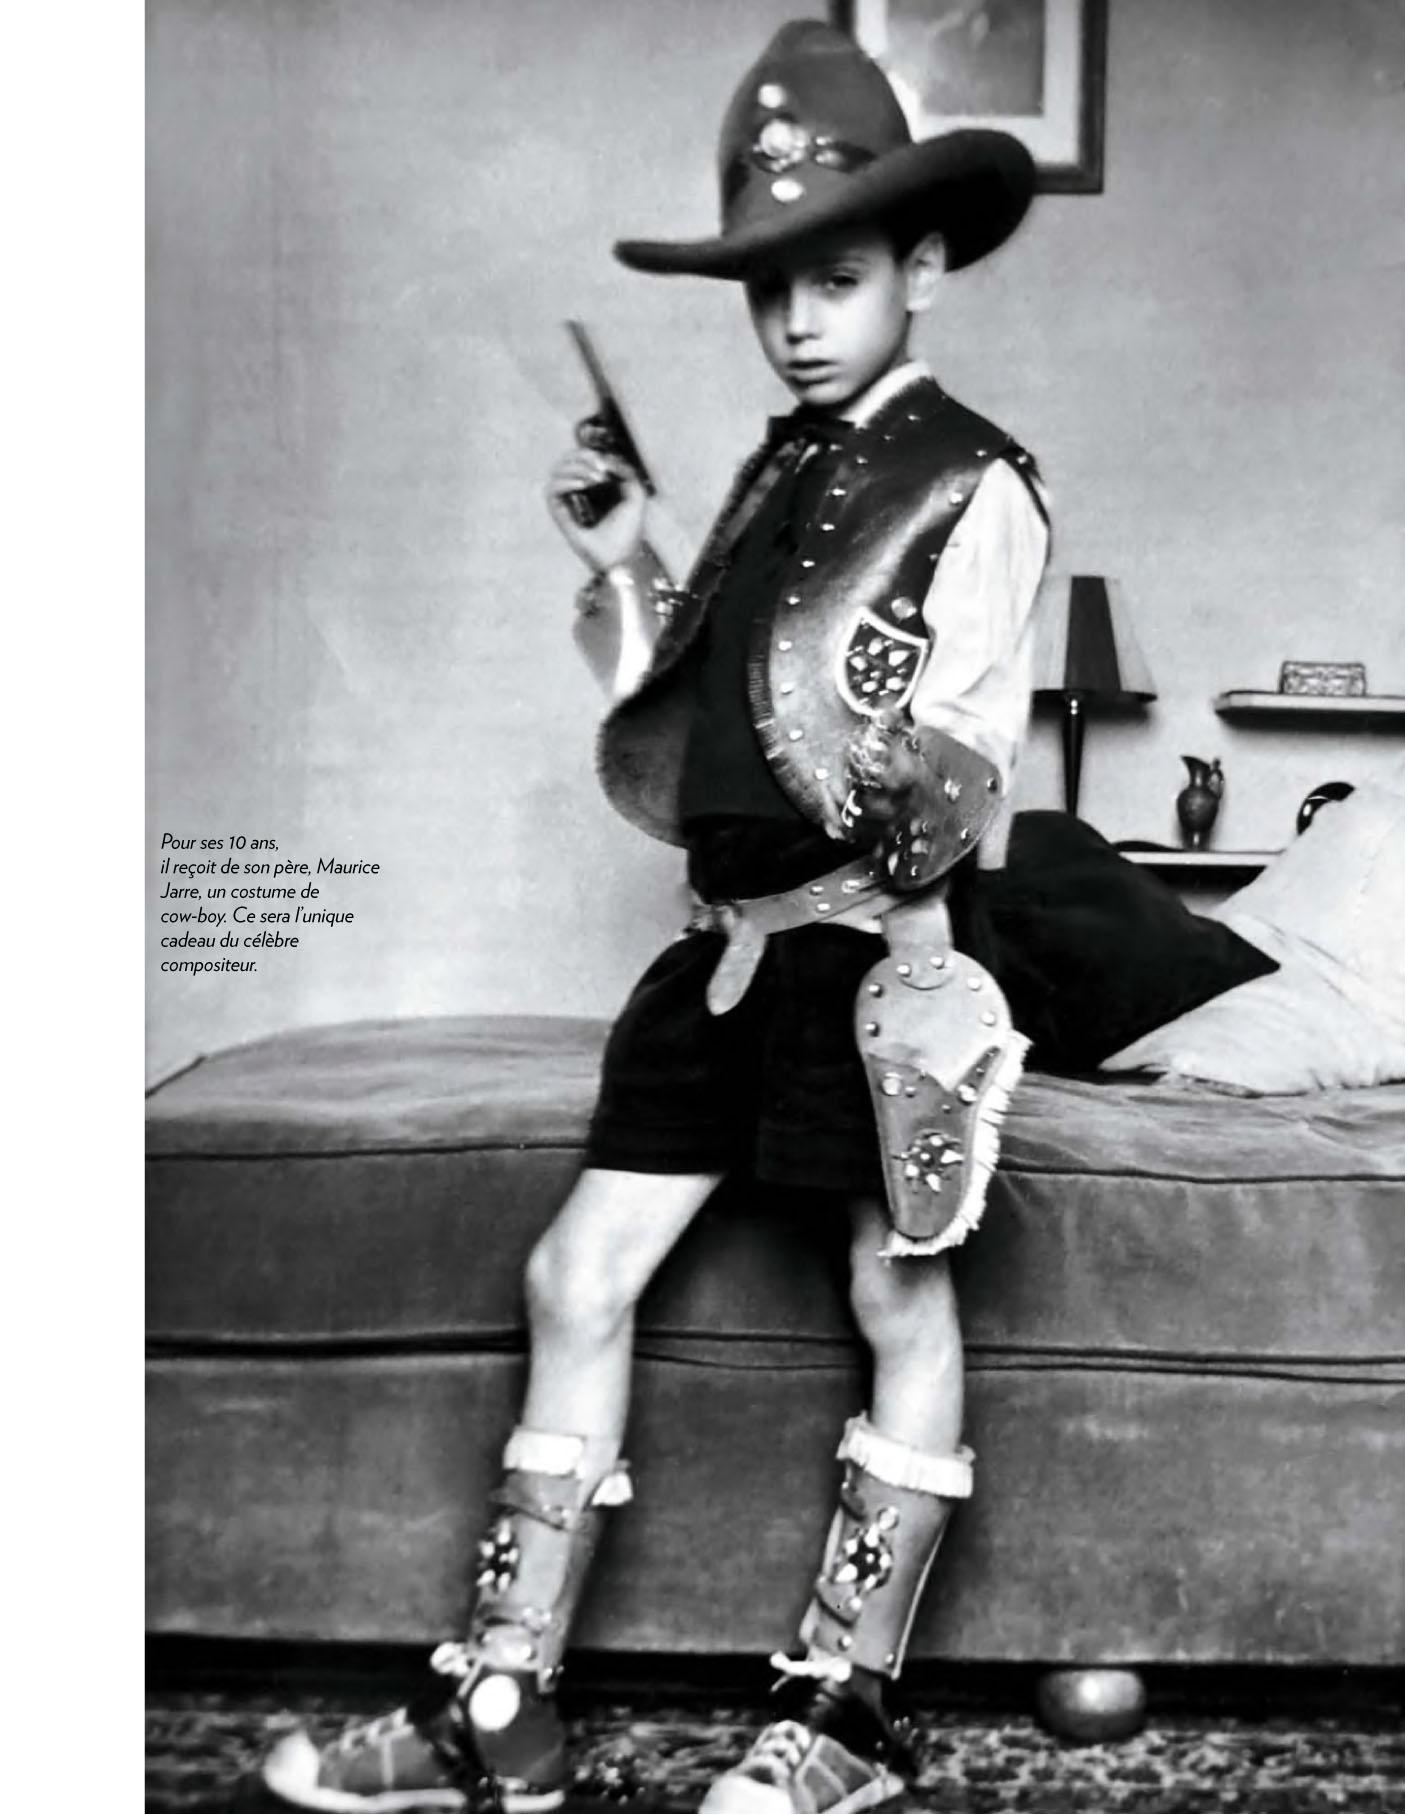 Paris Match 3676 191017 JM Jarre-4.jpg